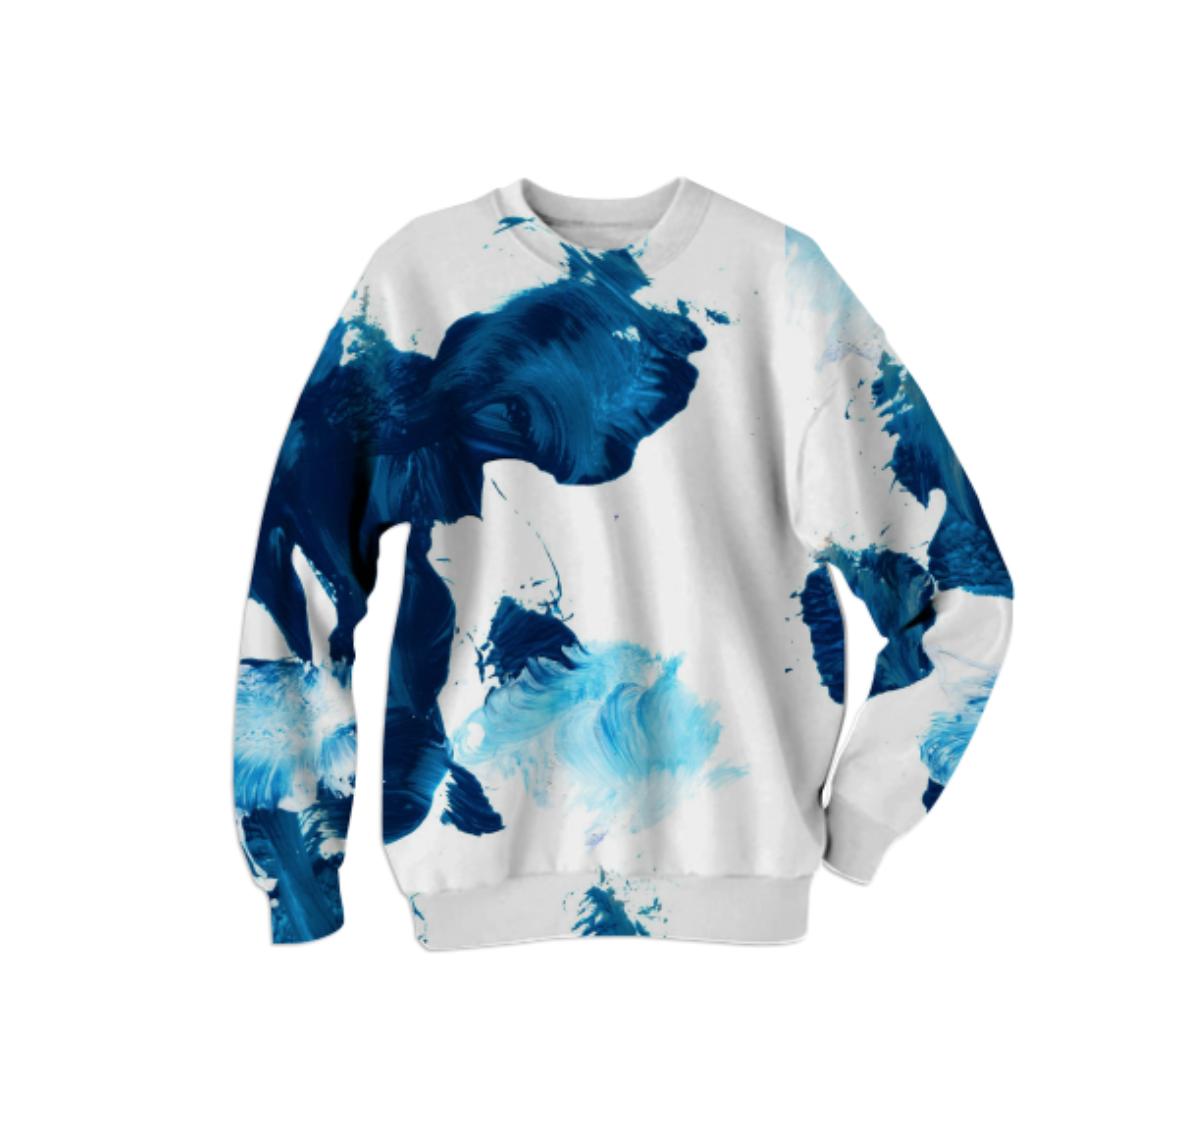 UNTITLED SWEATSHIRT    Cotton Sweatshirt      Sixty Eight Dollars